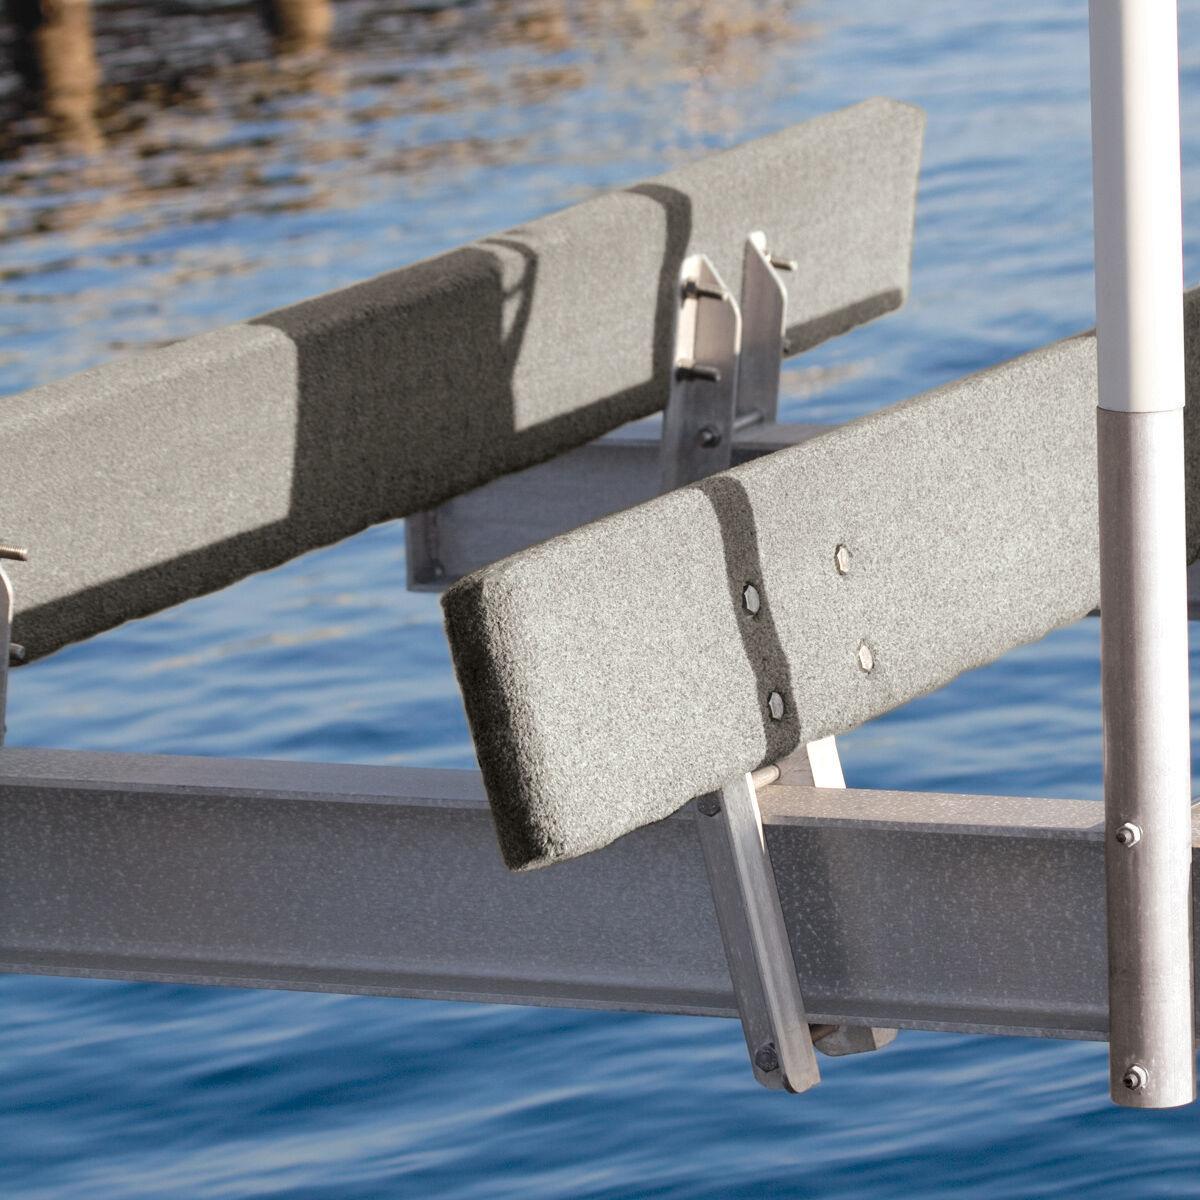 Dock Post AUGER 6-PACK for Dock Pier Boat Lift Sand Anchor Parts